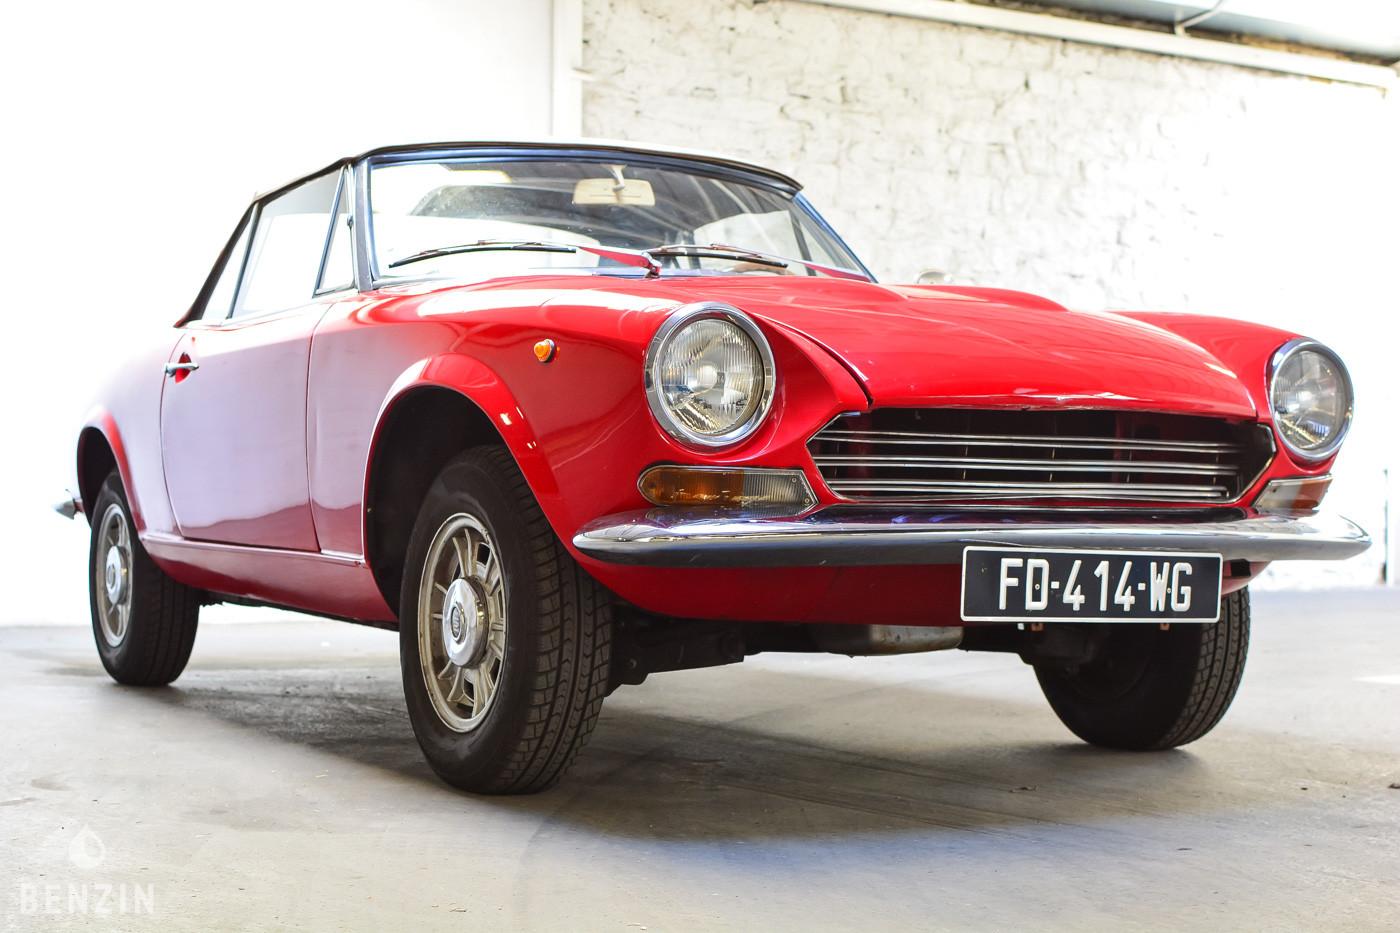 FIAT 124 SPORT 1968 FOR SALE EN VENTE EN VENDITA TE KOOP SU VERKAUFEN